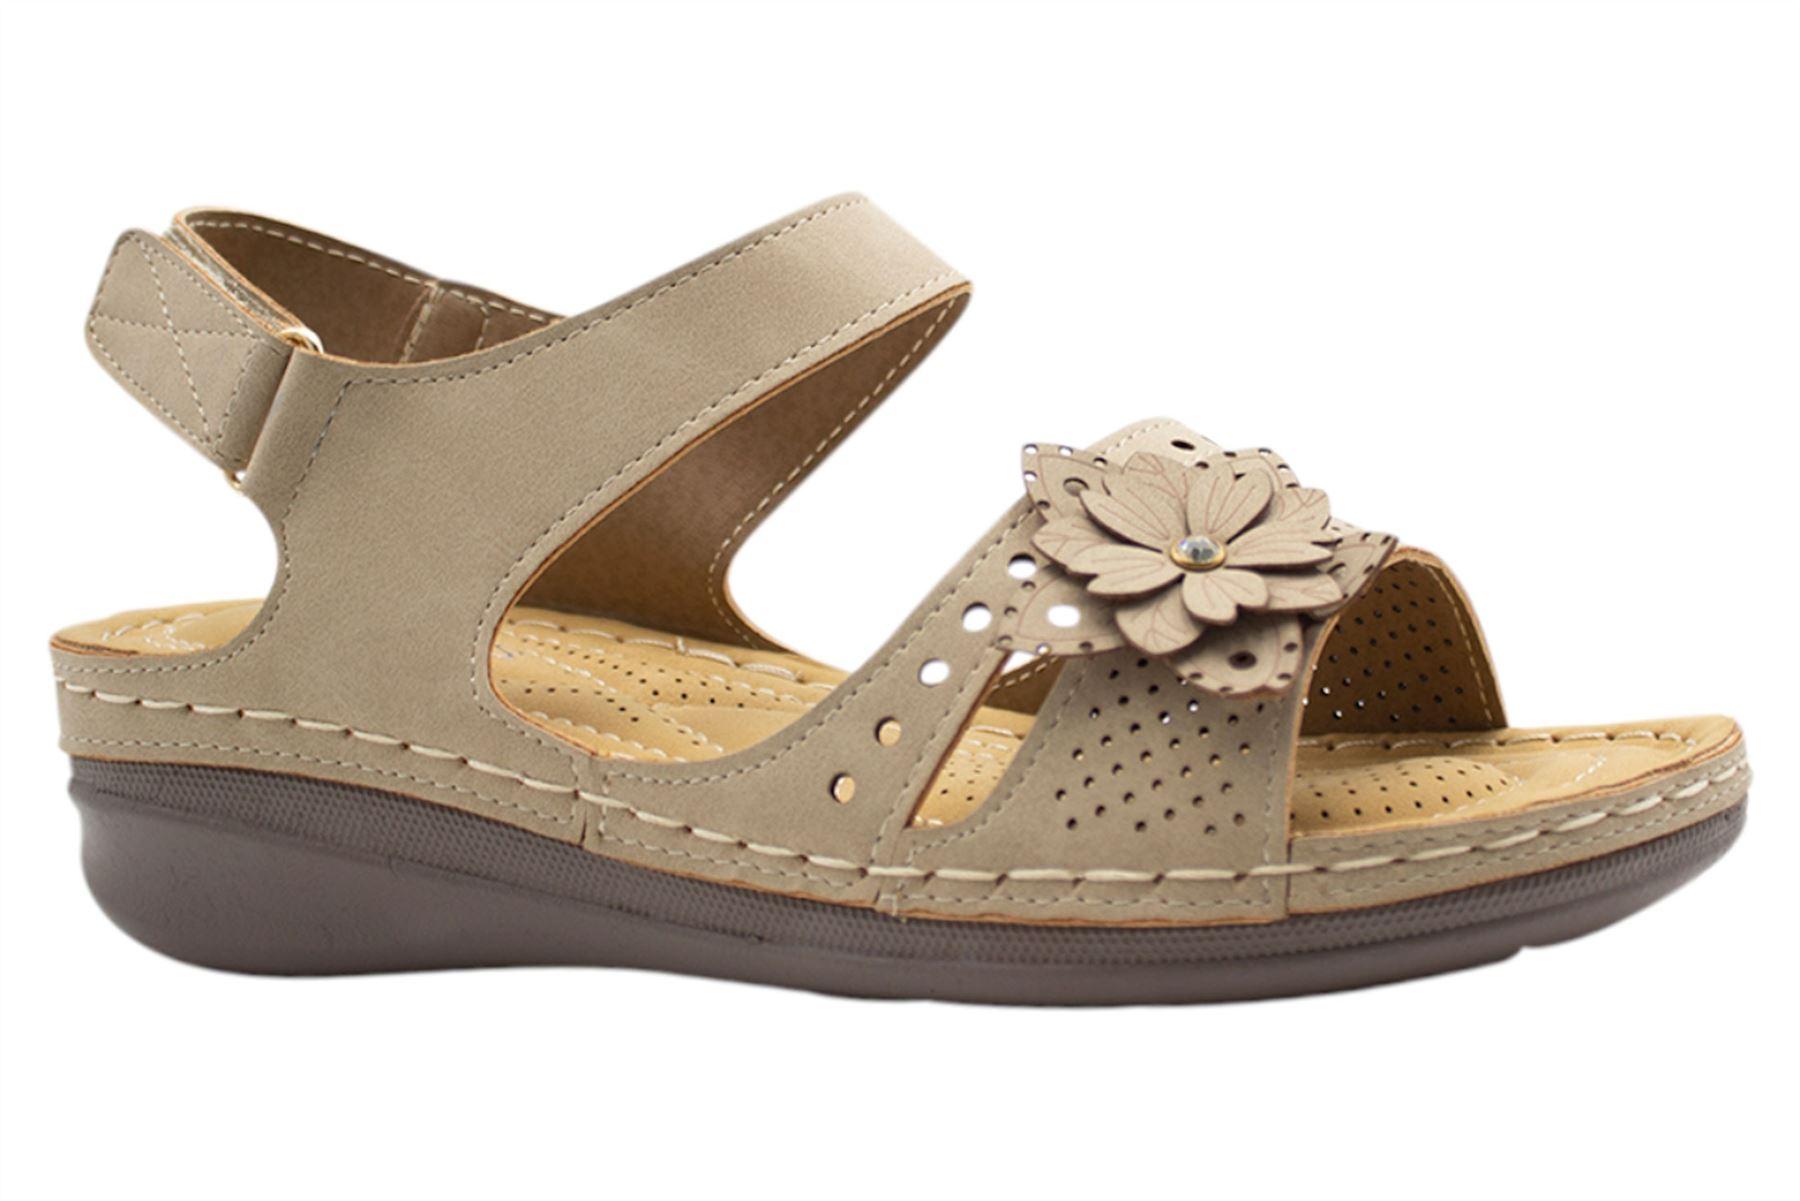 Ladies-Wedge-Heel-Sandal-Womens-Comfort-Cushion-Strapy-Summer-Shoes miniatura 7